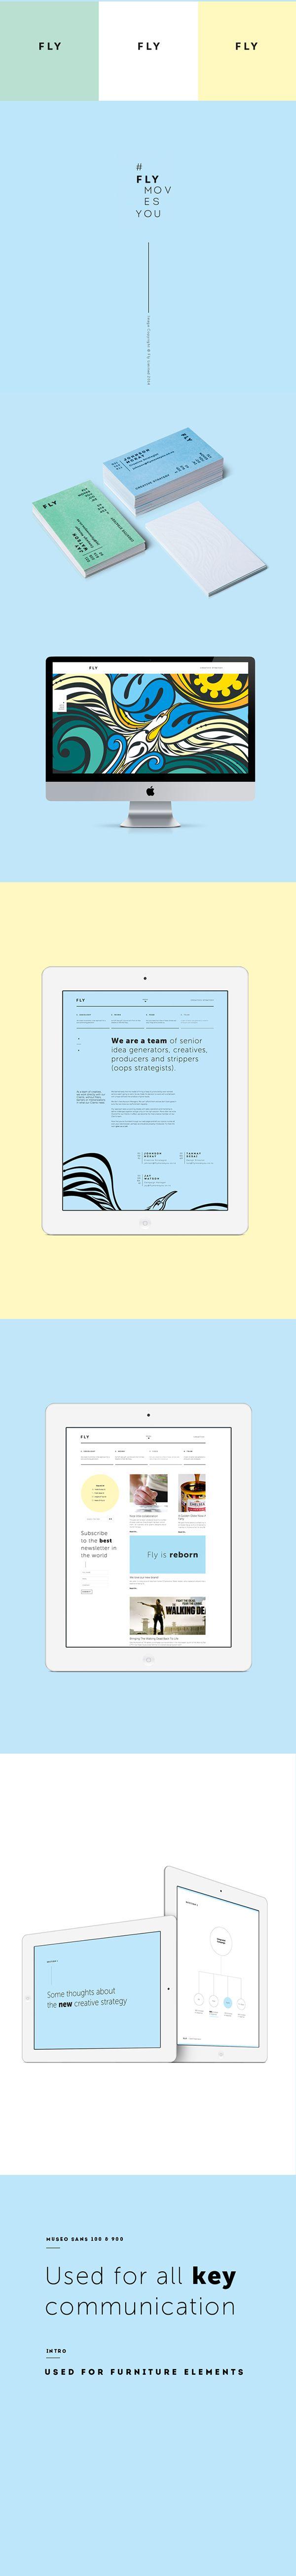 Fly: Branding by Tanmay Desai, via Behance